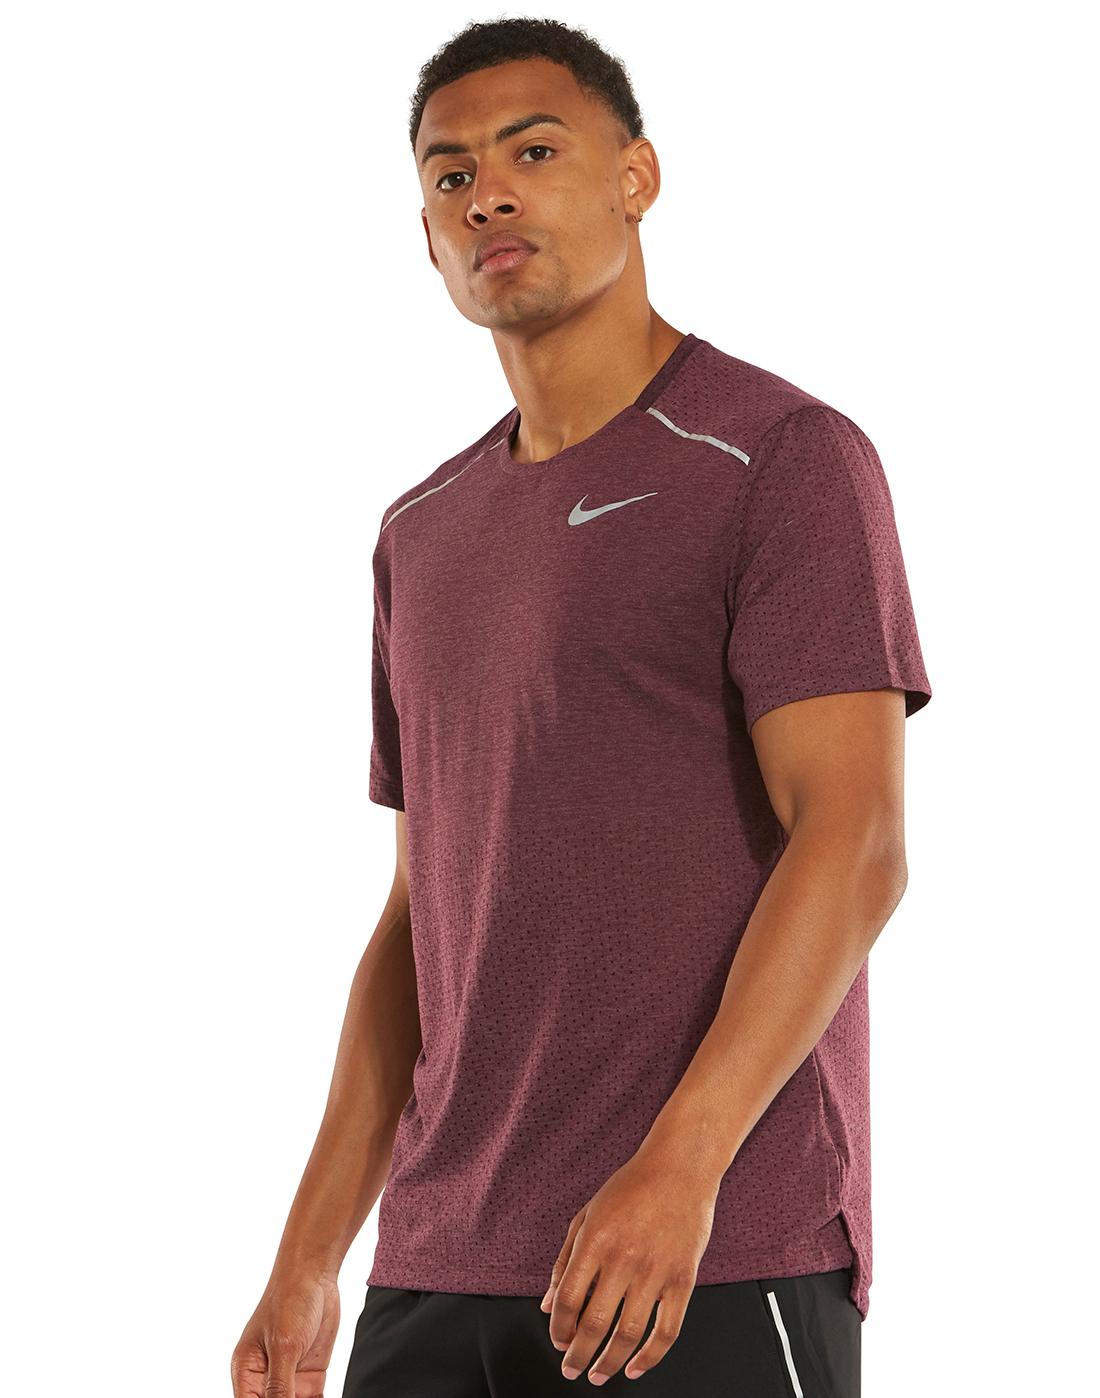 6012f2e9c Men's Burgundy Nike Breathe Rise Running T-Shirt | Life Style Sports